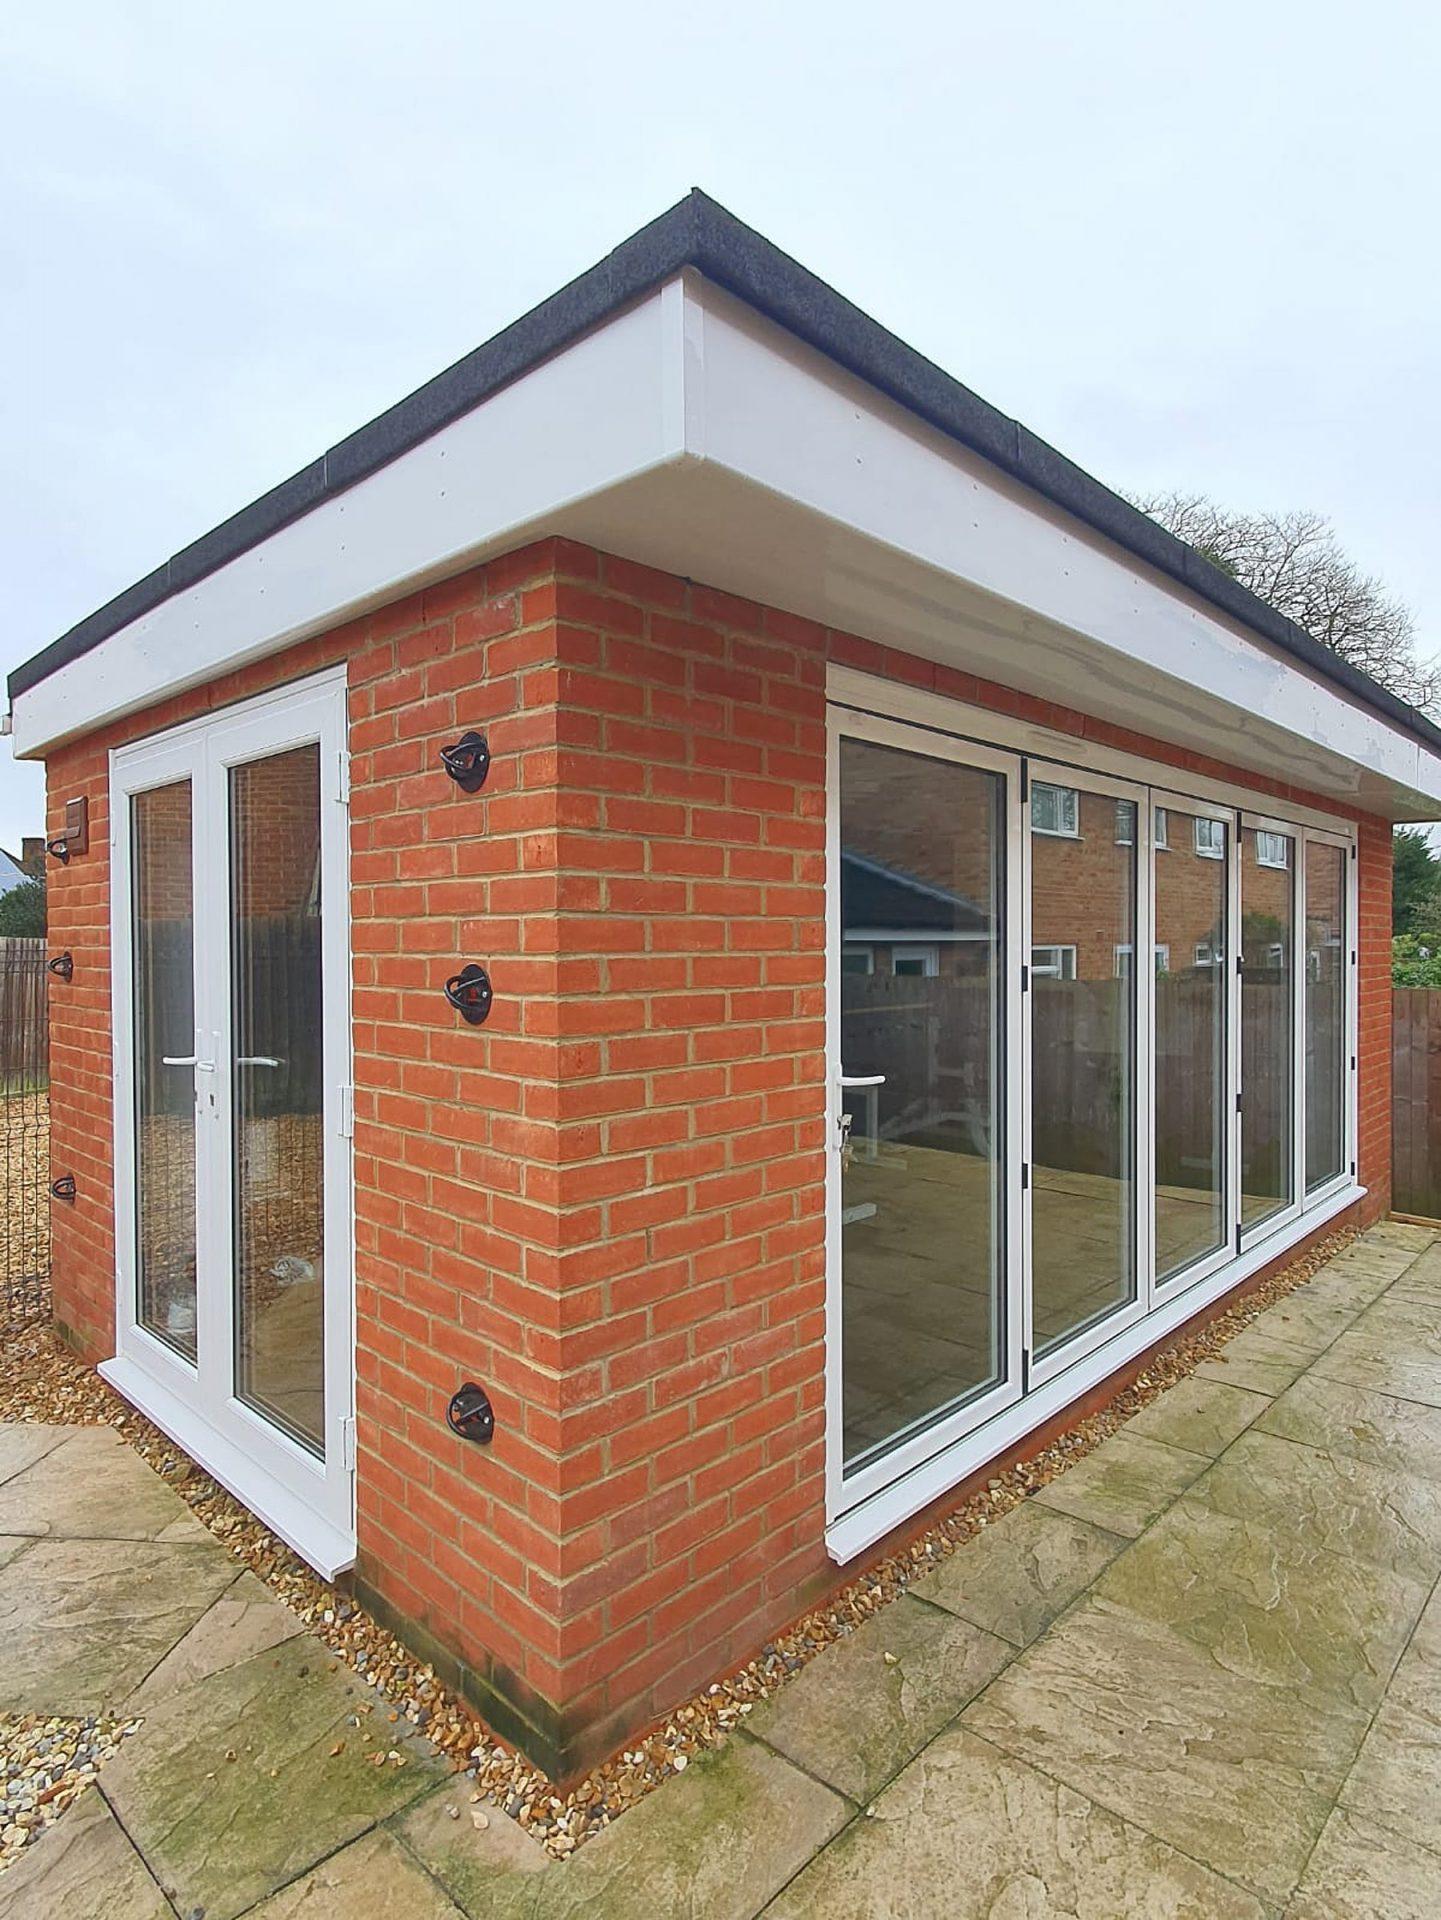 Bifold Doors by Excellent Windows in Basingstoke